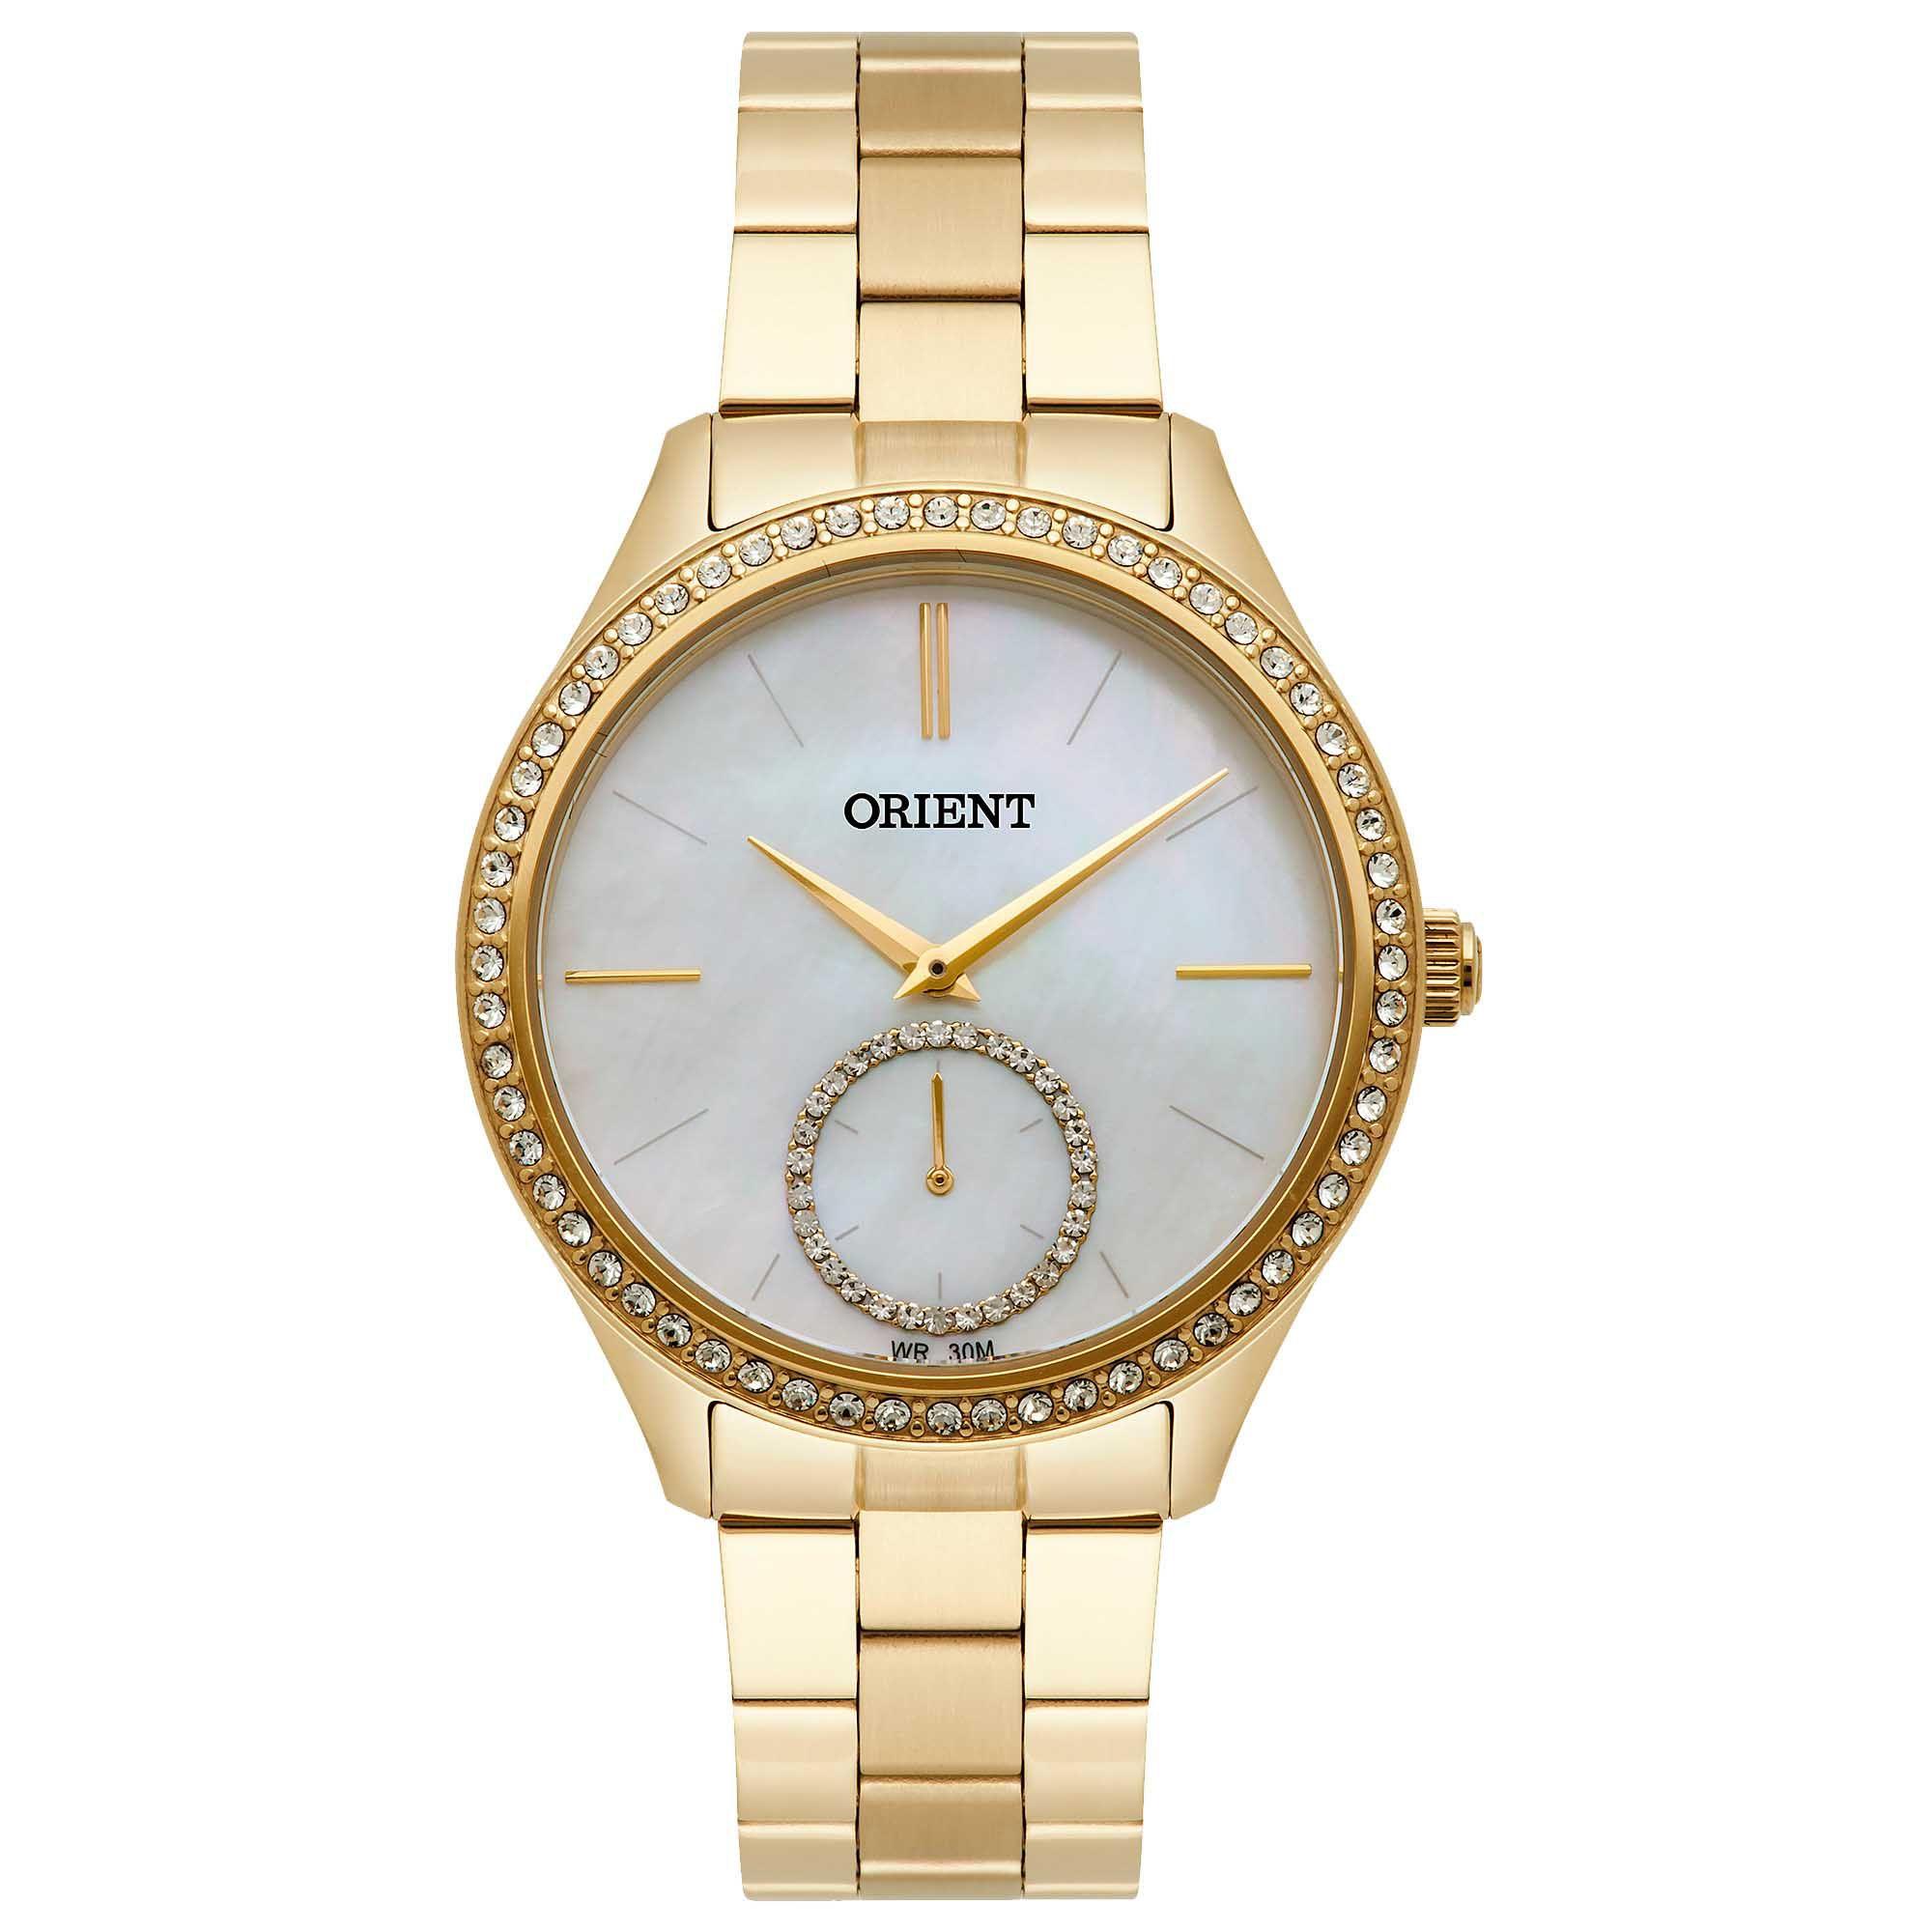 Relógio Feminino Orient FGSS0104 B1KX